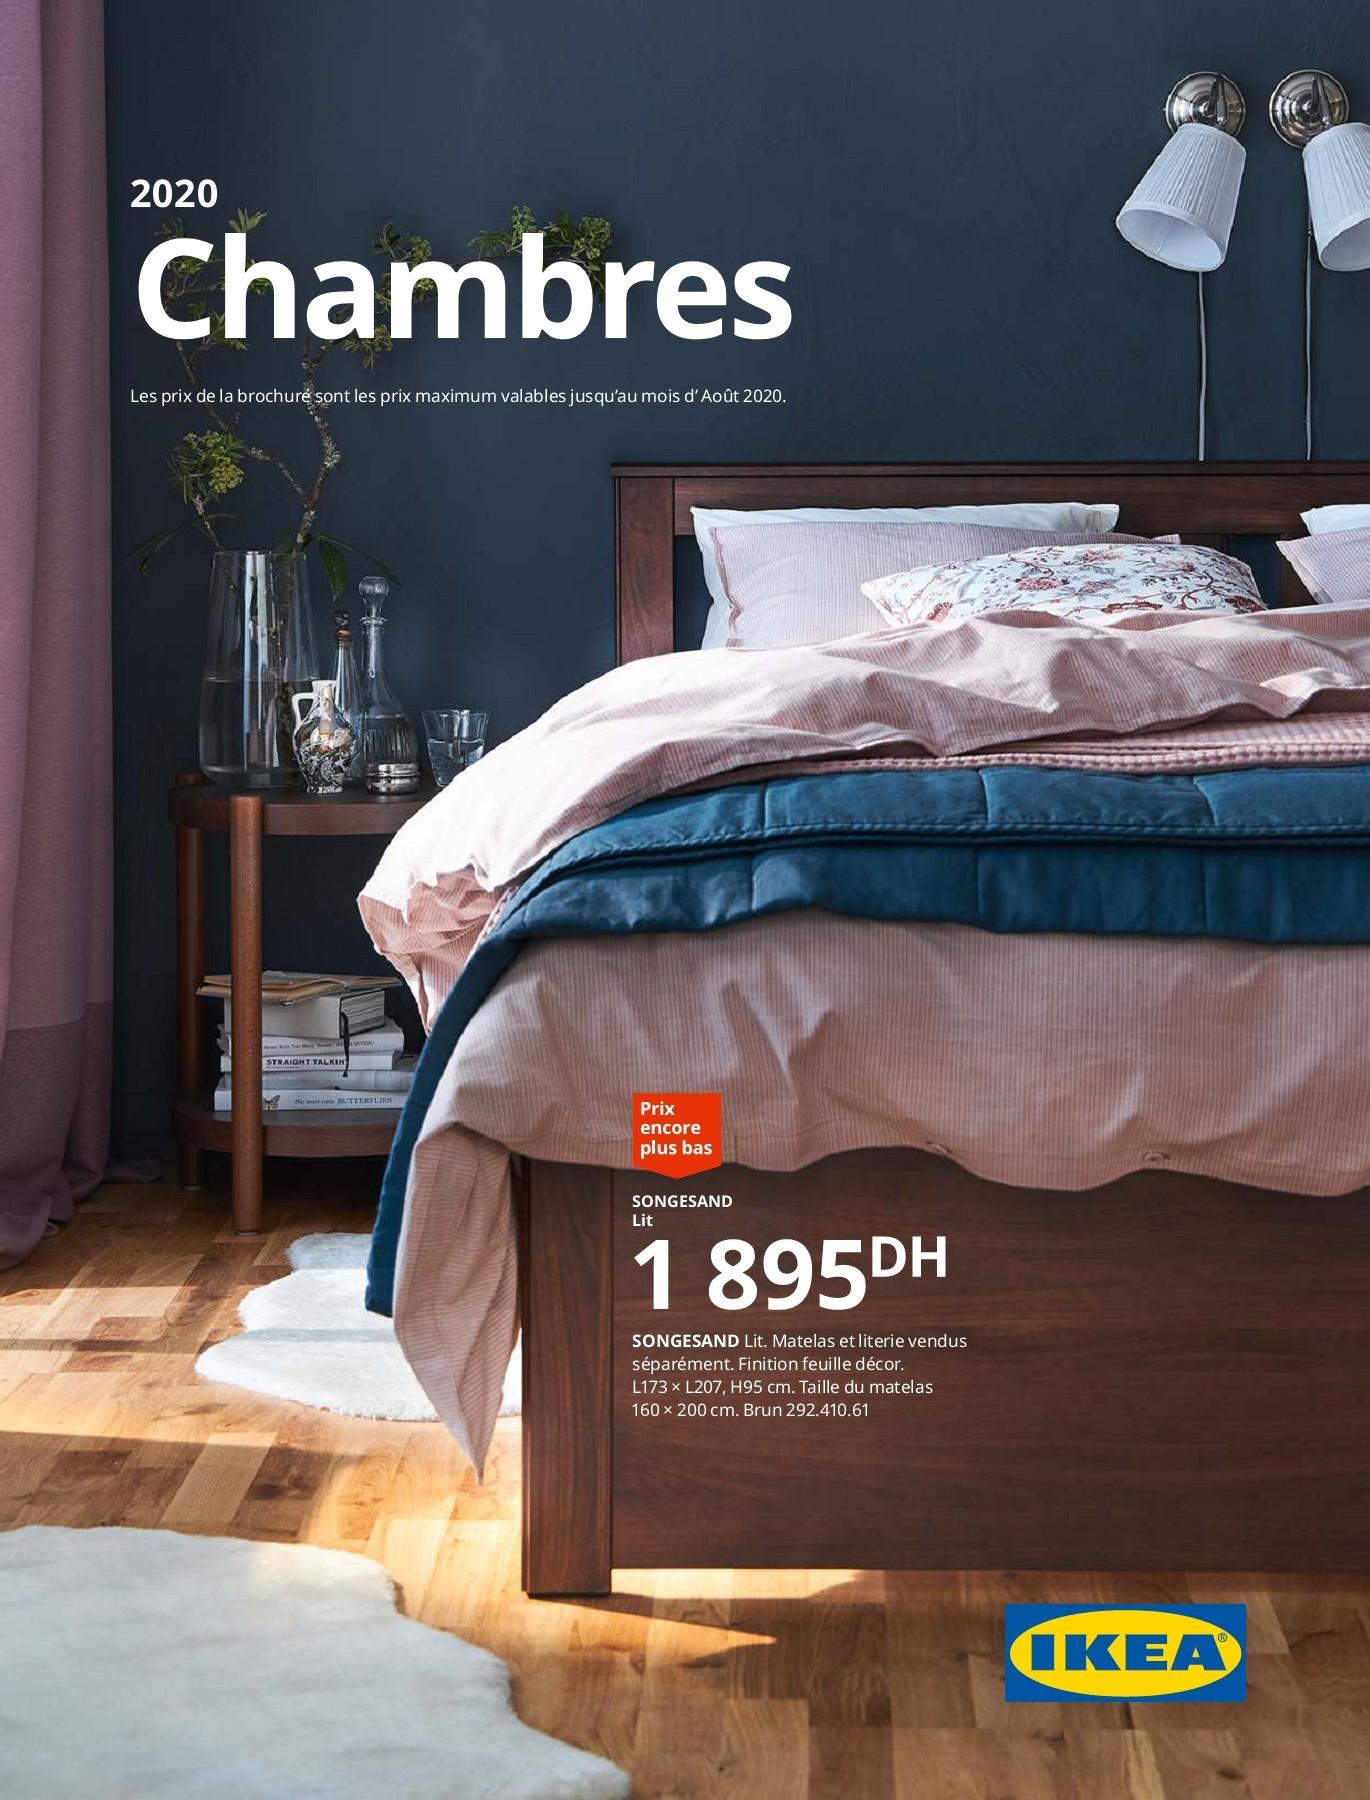 Ikea Maroc Catalogue 2020 Chambre A Coucher Pages 1 40 Flip Pdf Download Fliphtml5